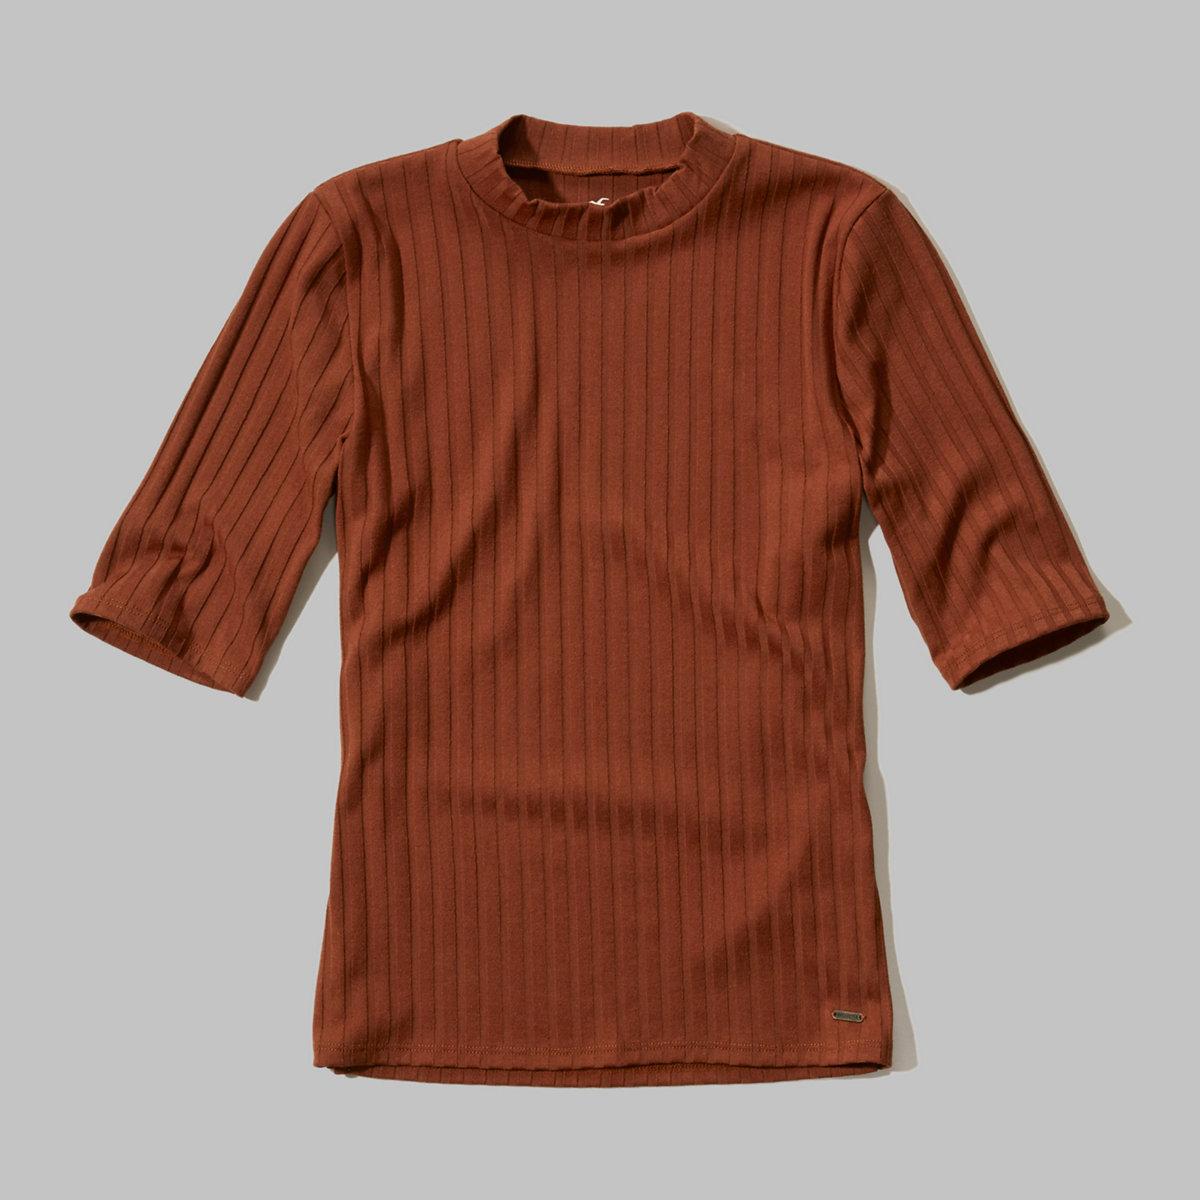 Ribbed Half-Sleeve Mock Neck Shirt